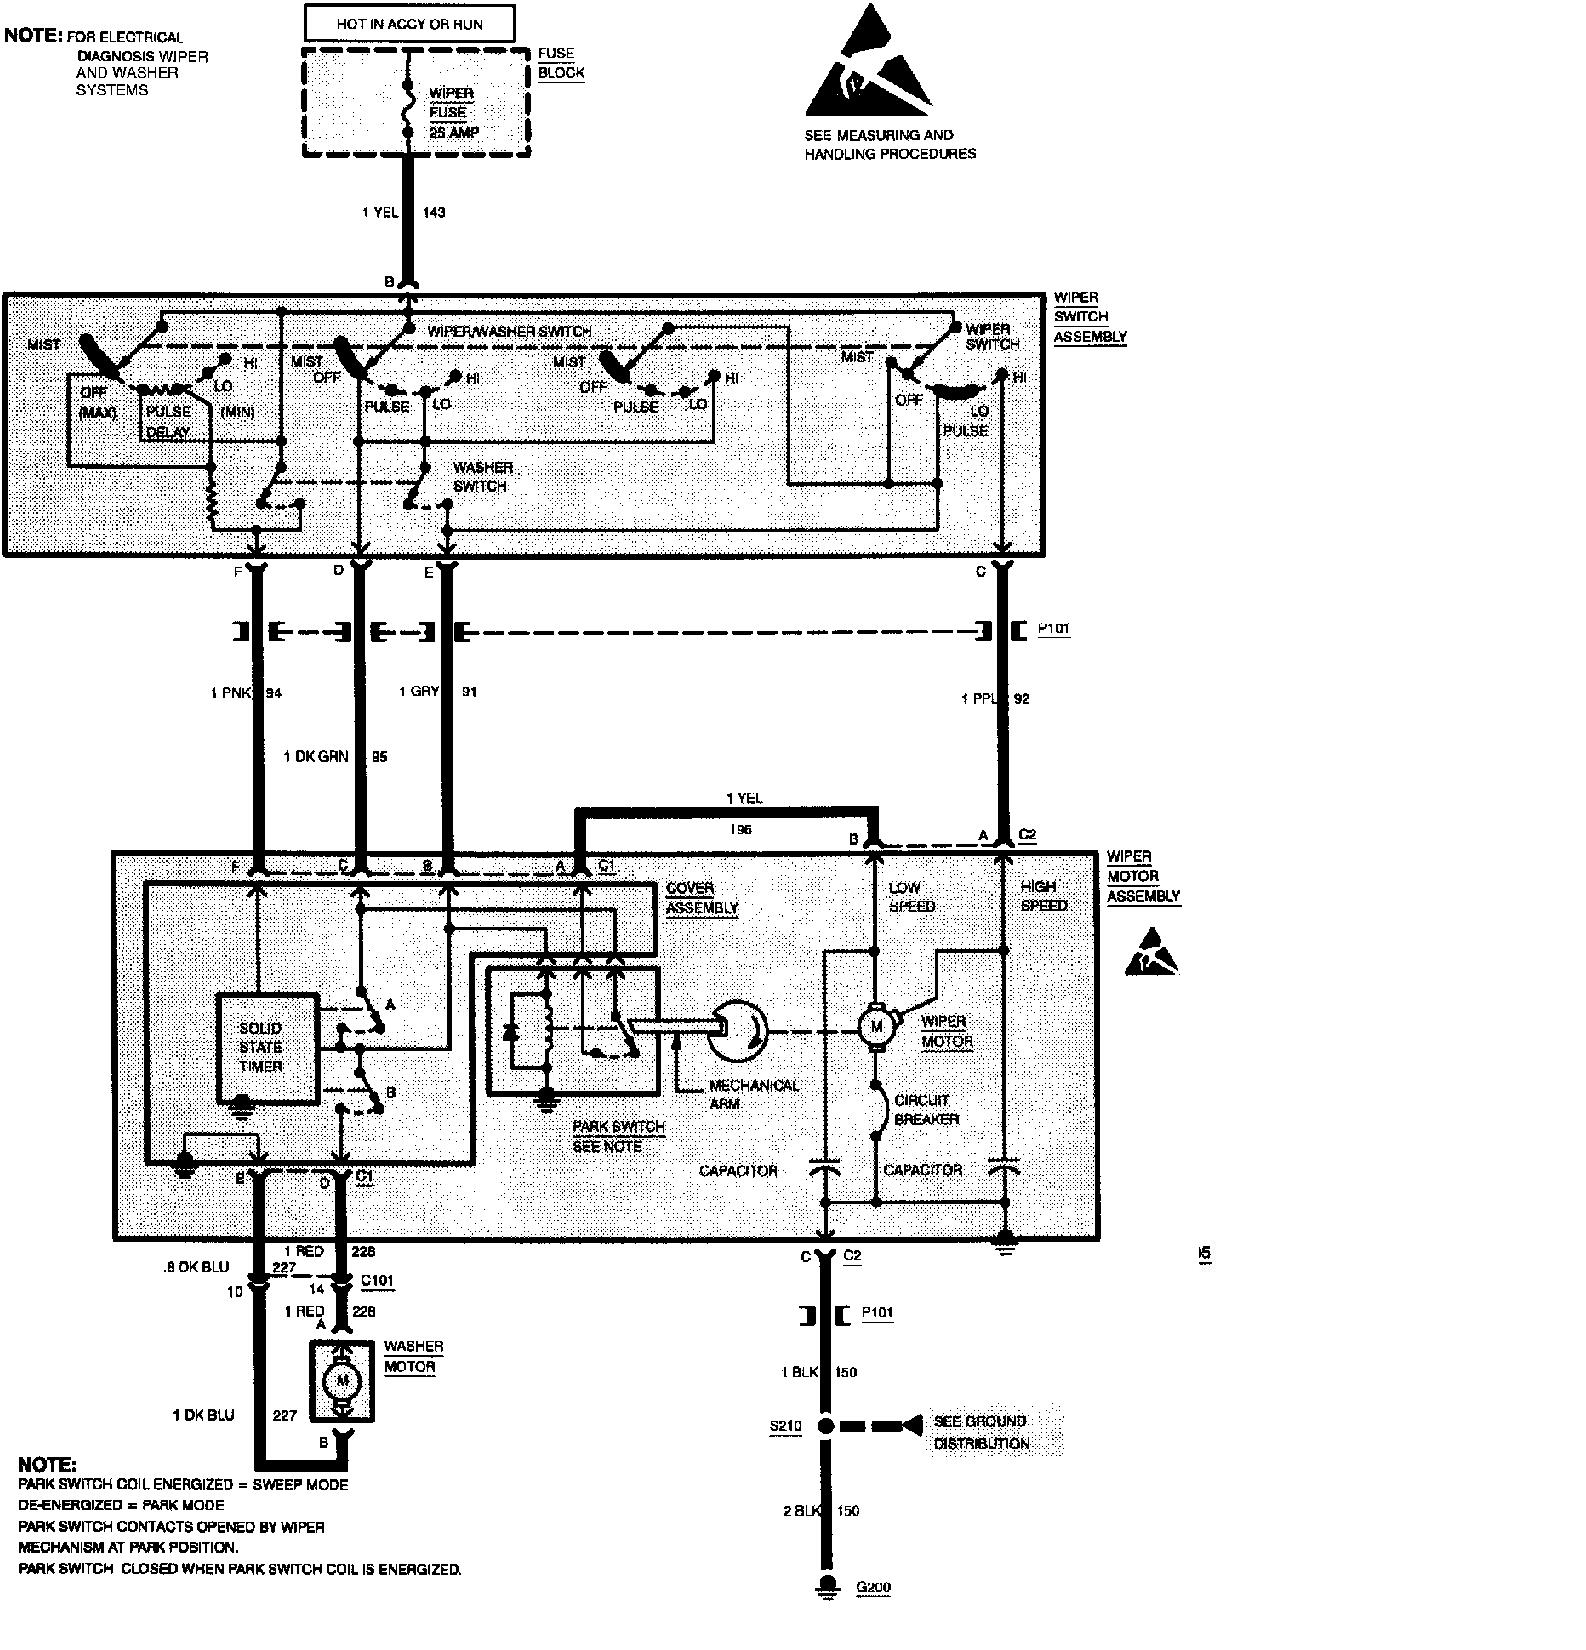 similiar 99 grand am radio wiring diagram keywords wiring diagram pontiac grand am 2000 model stereo wiring diagram 19